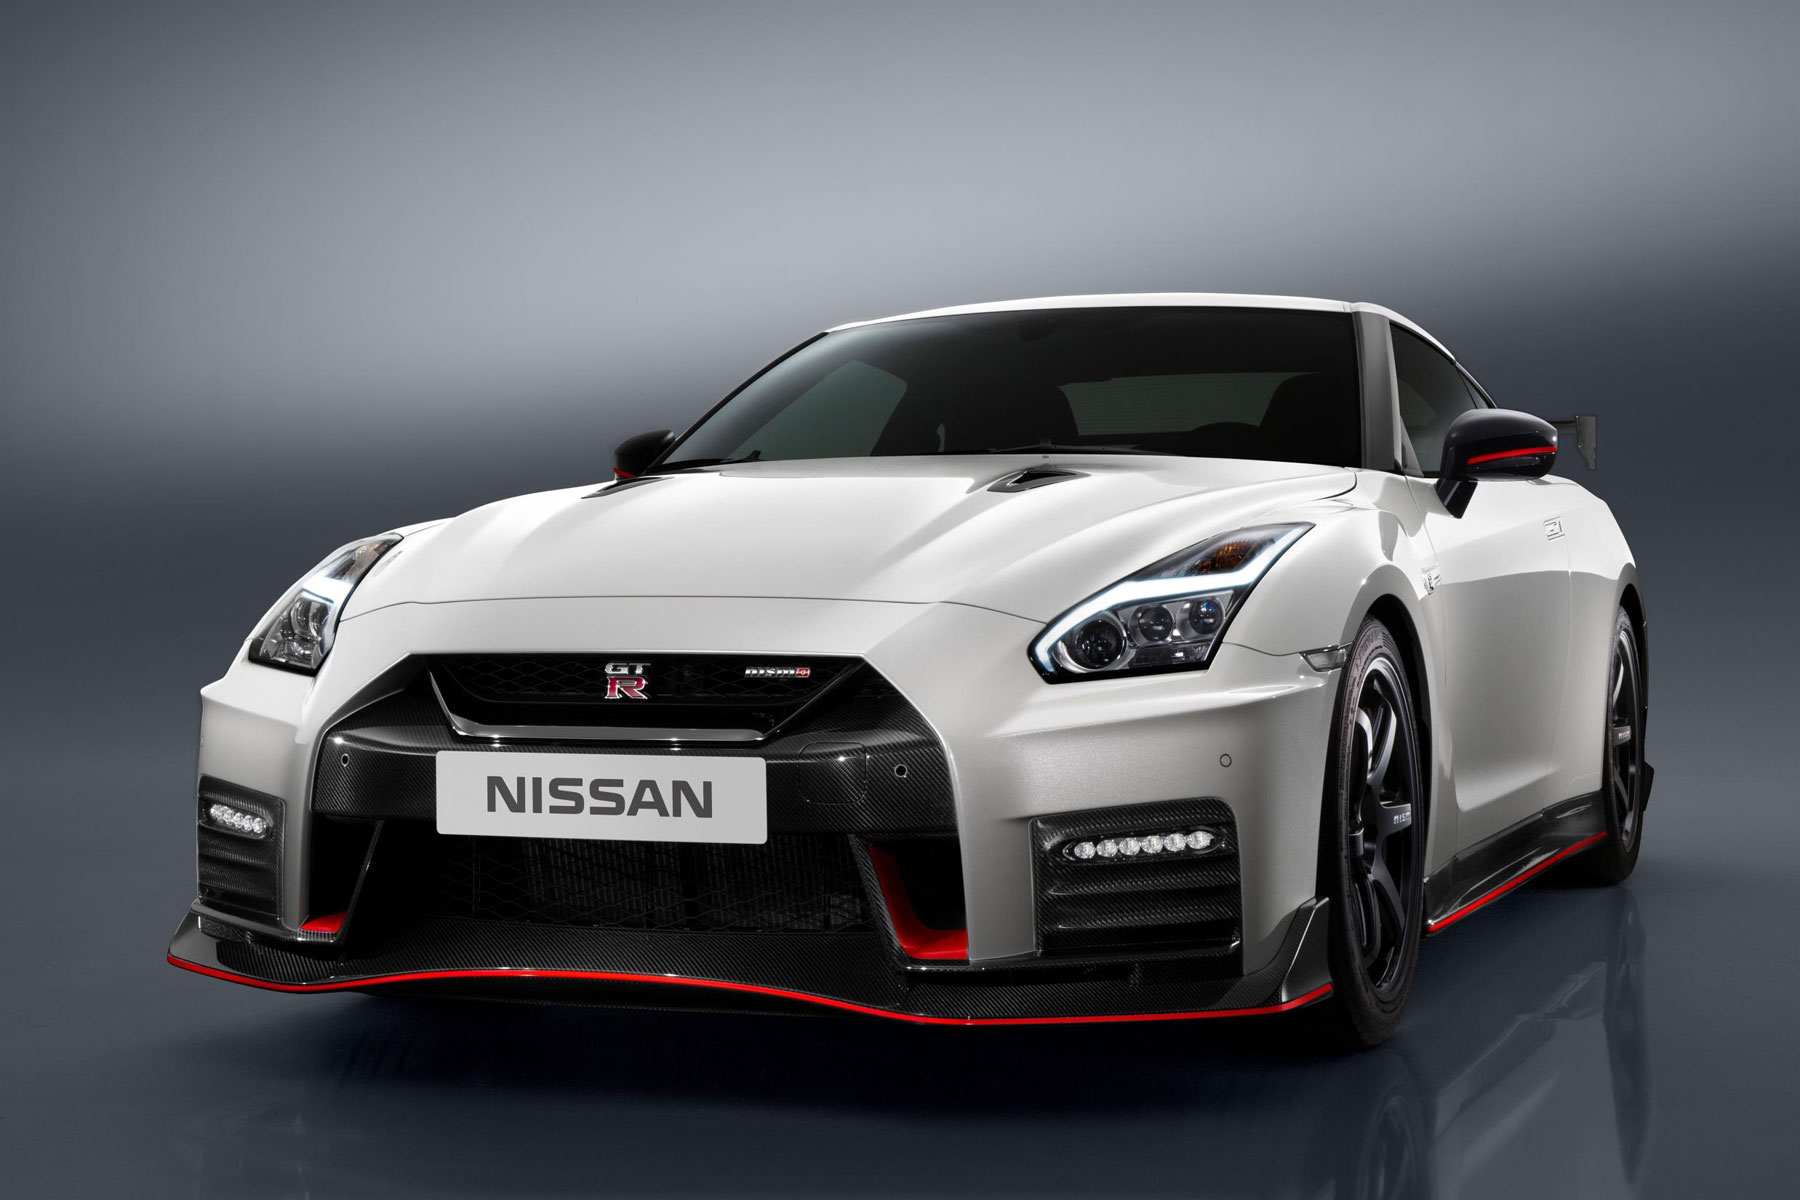 Nissan GT-R Nismo – 2.7 seconds